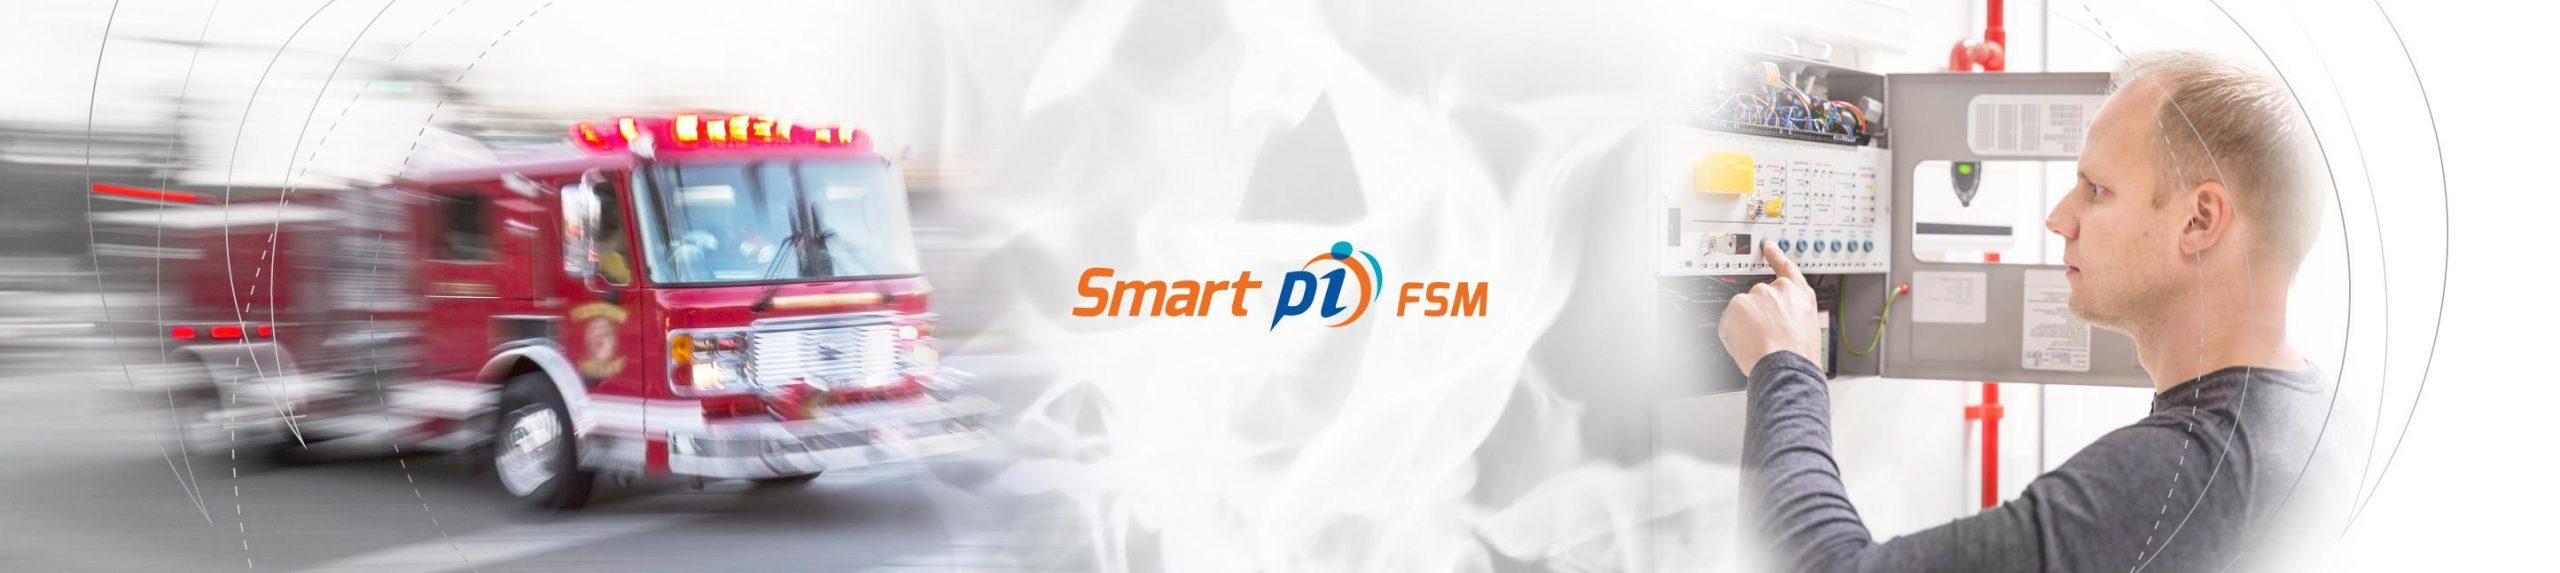 Smart Pi FSM